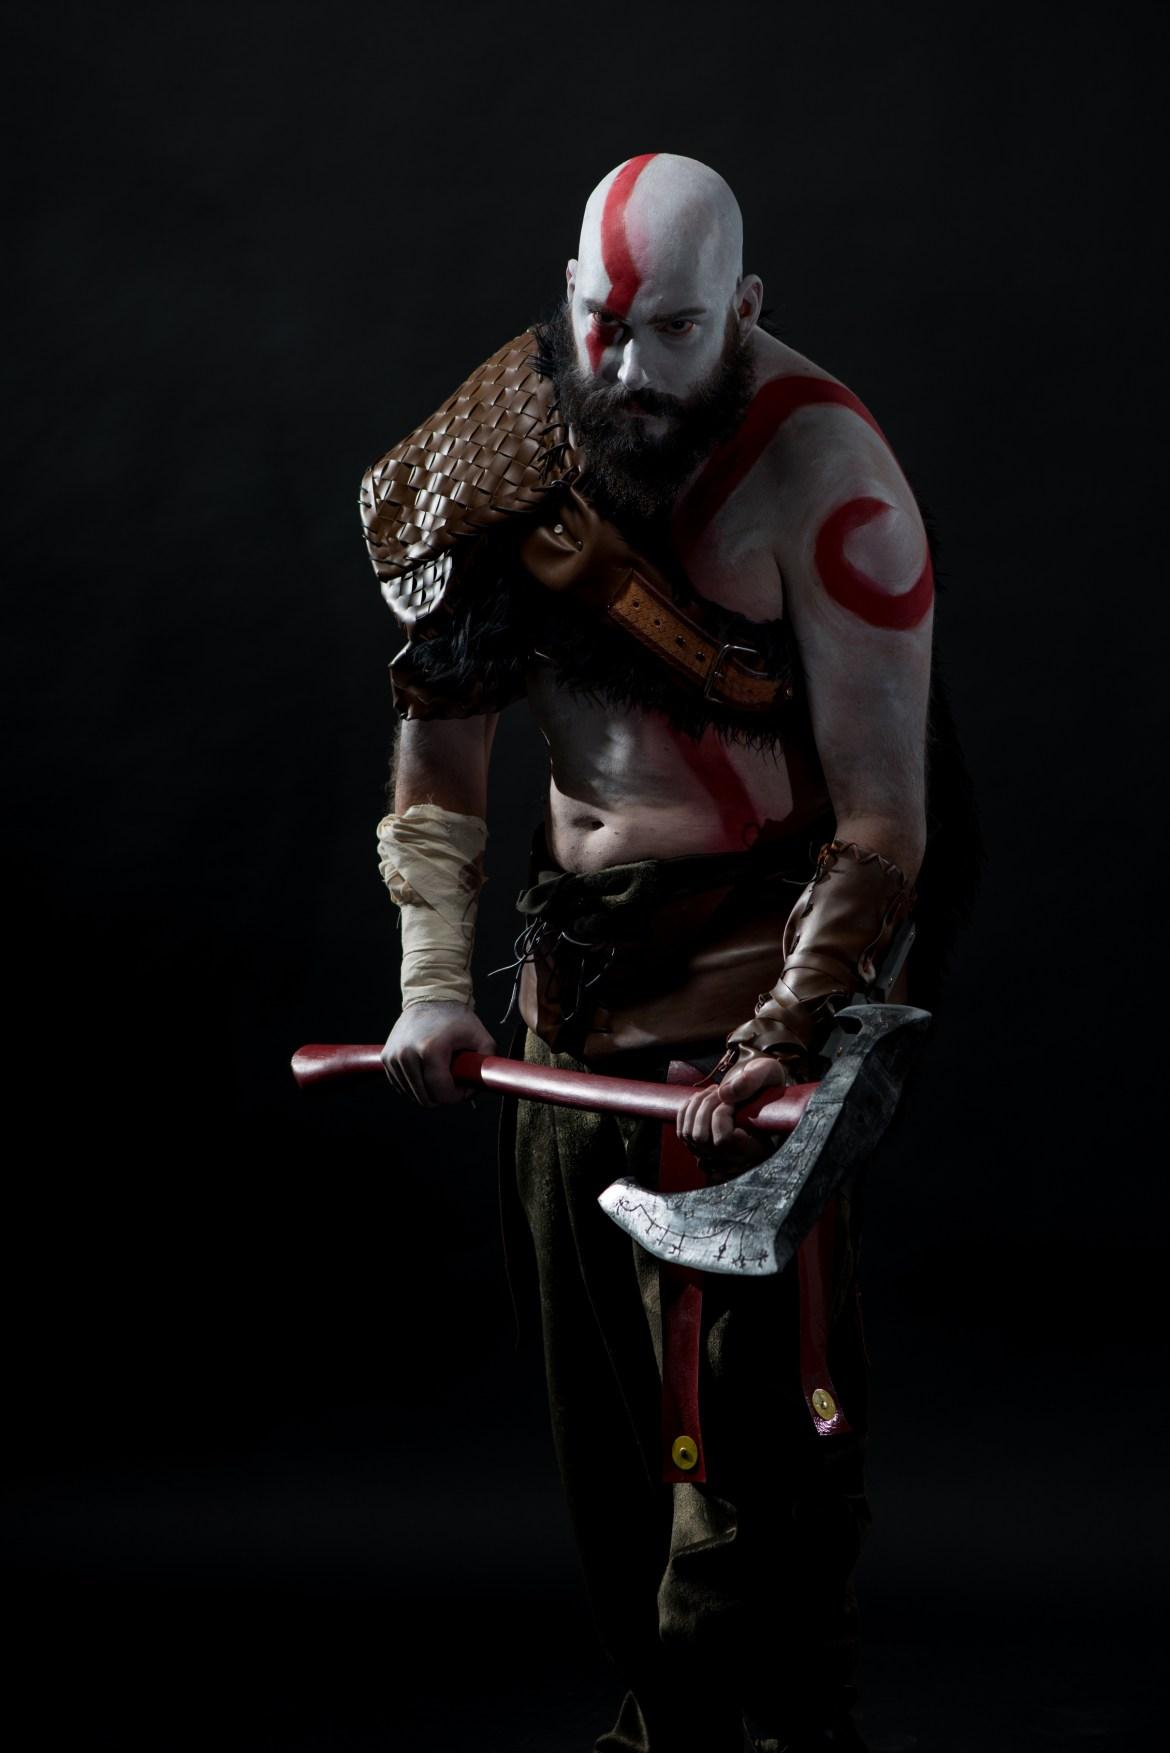 troy-schram-kratos-cosplay-god-of-war-photo-damon-wilson-hart-1-gamersrd